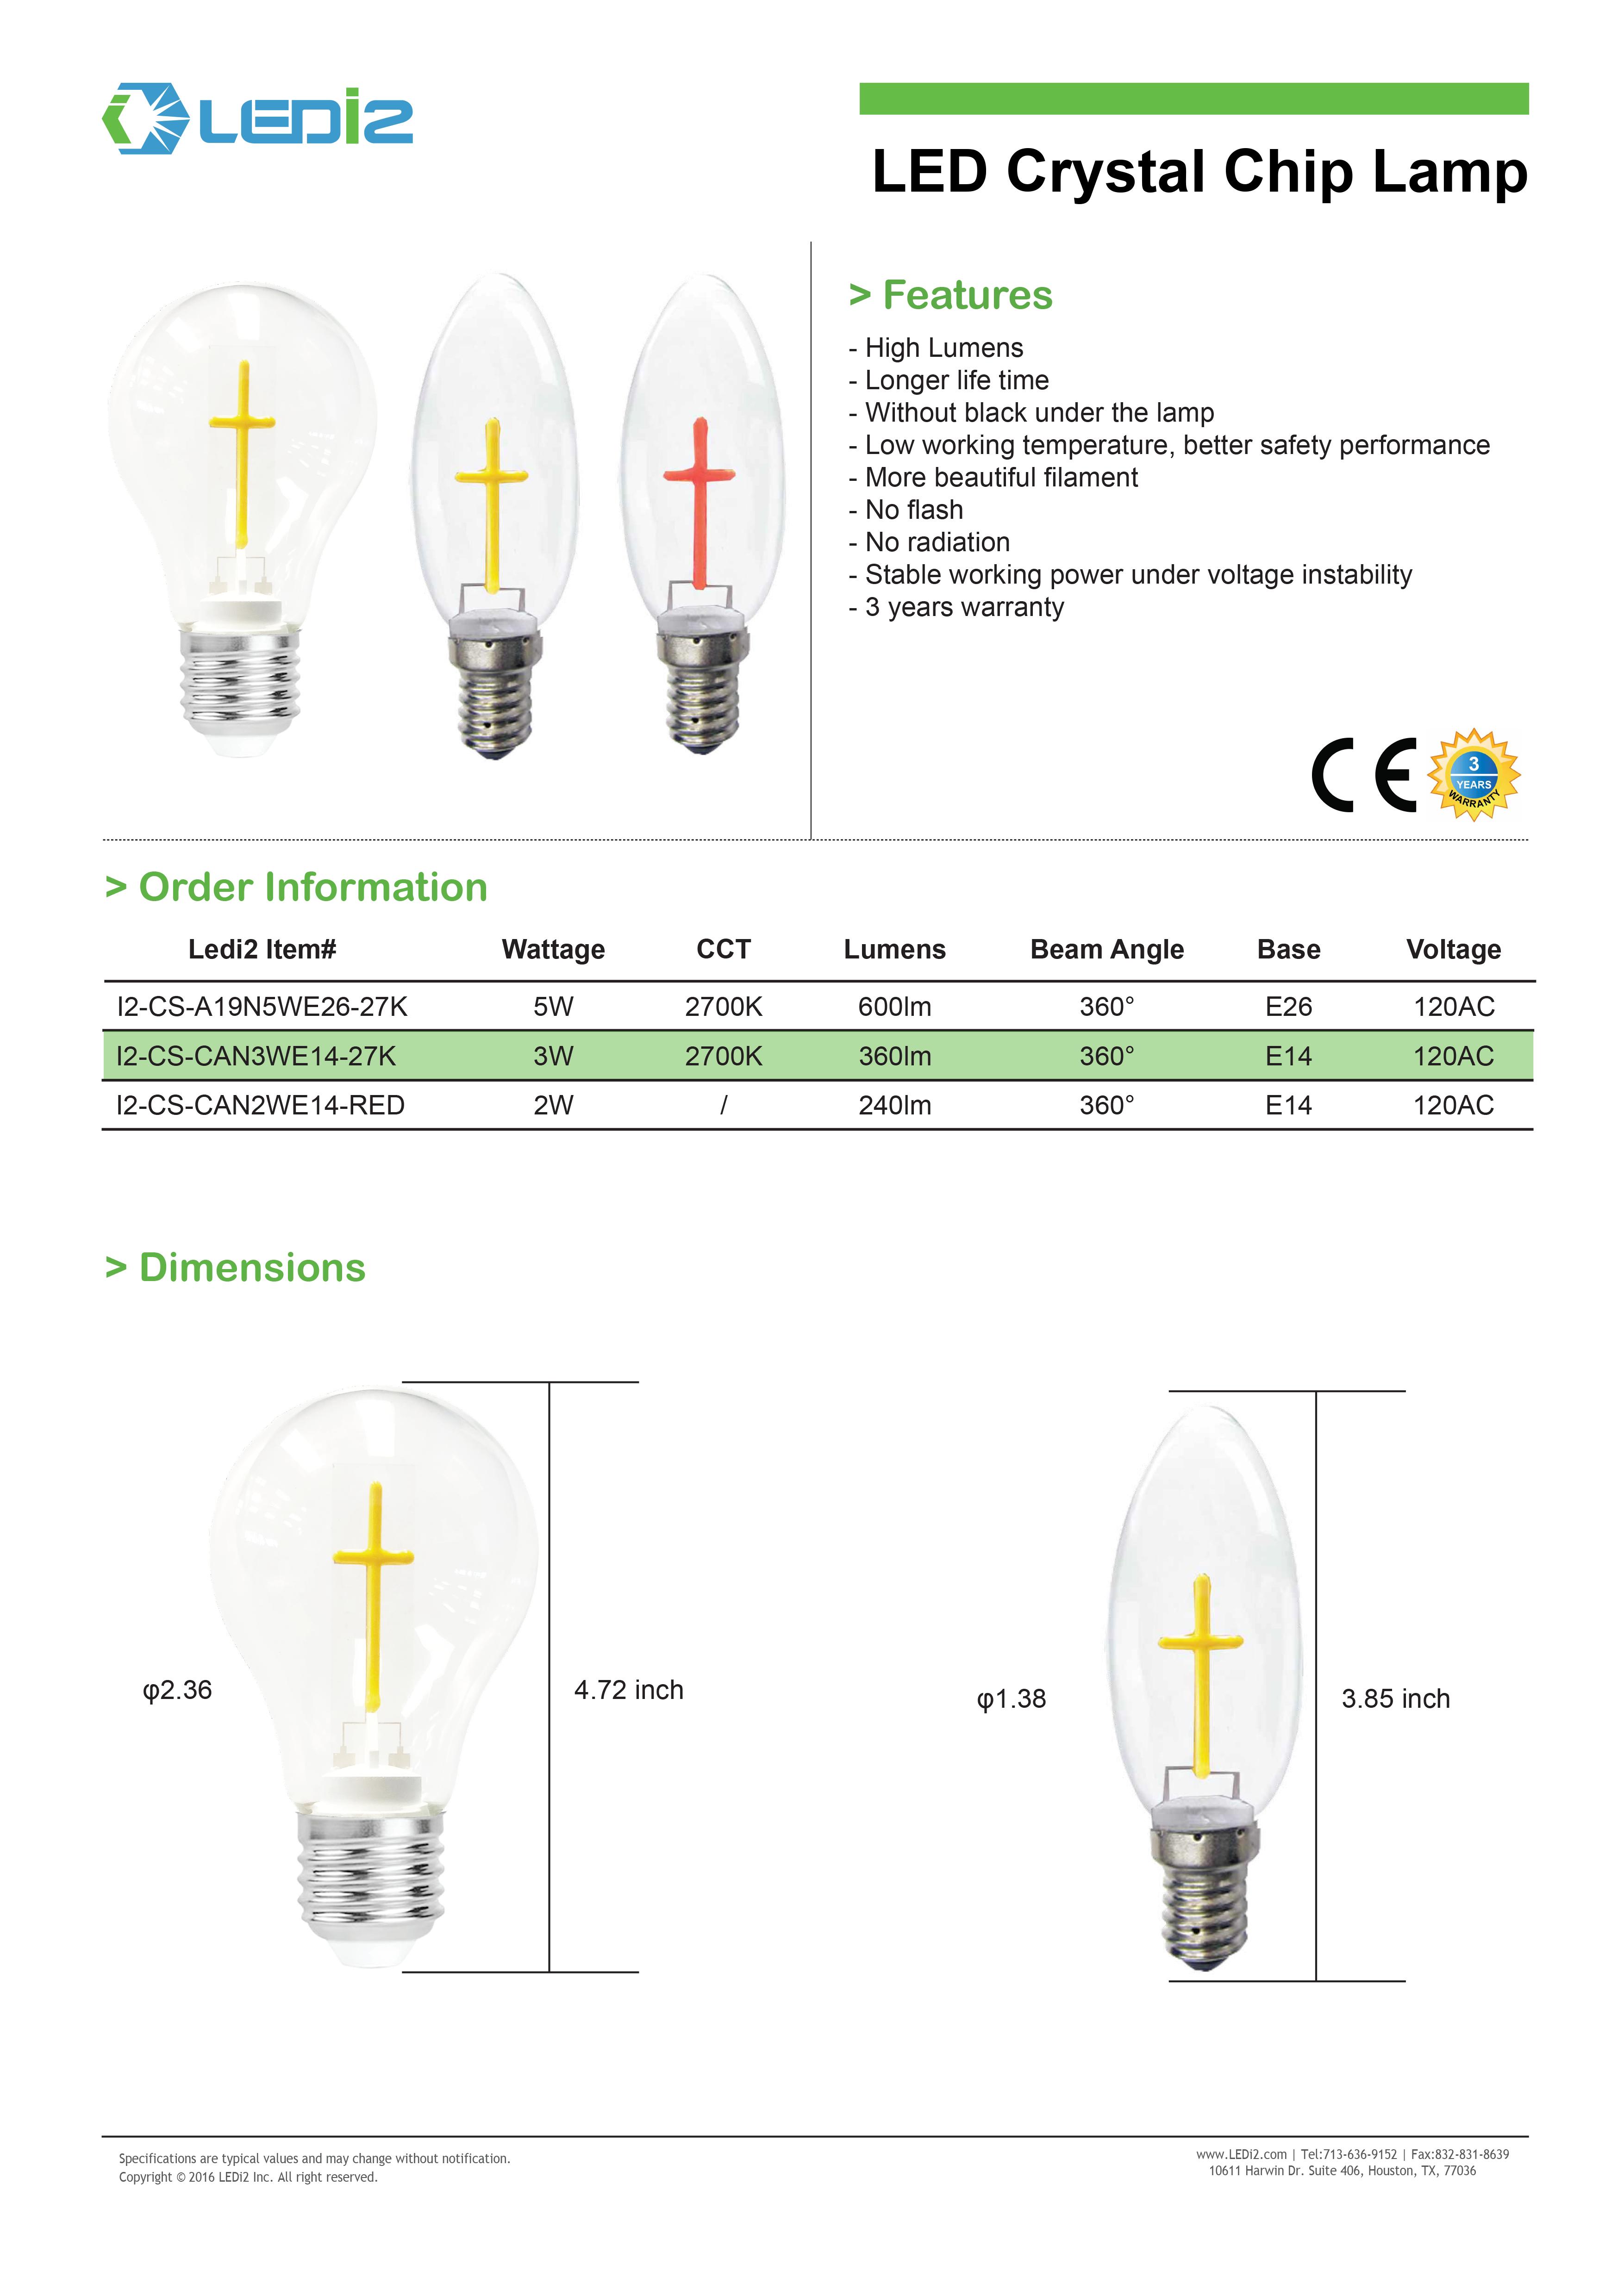 led-crystal-chip-lamp.png